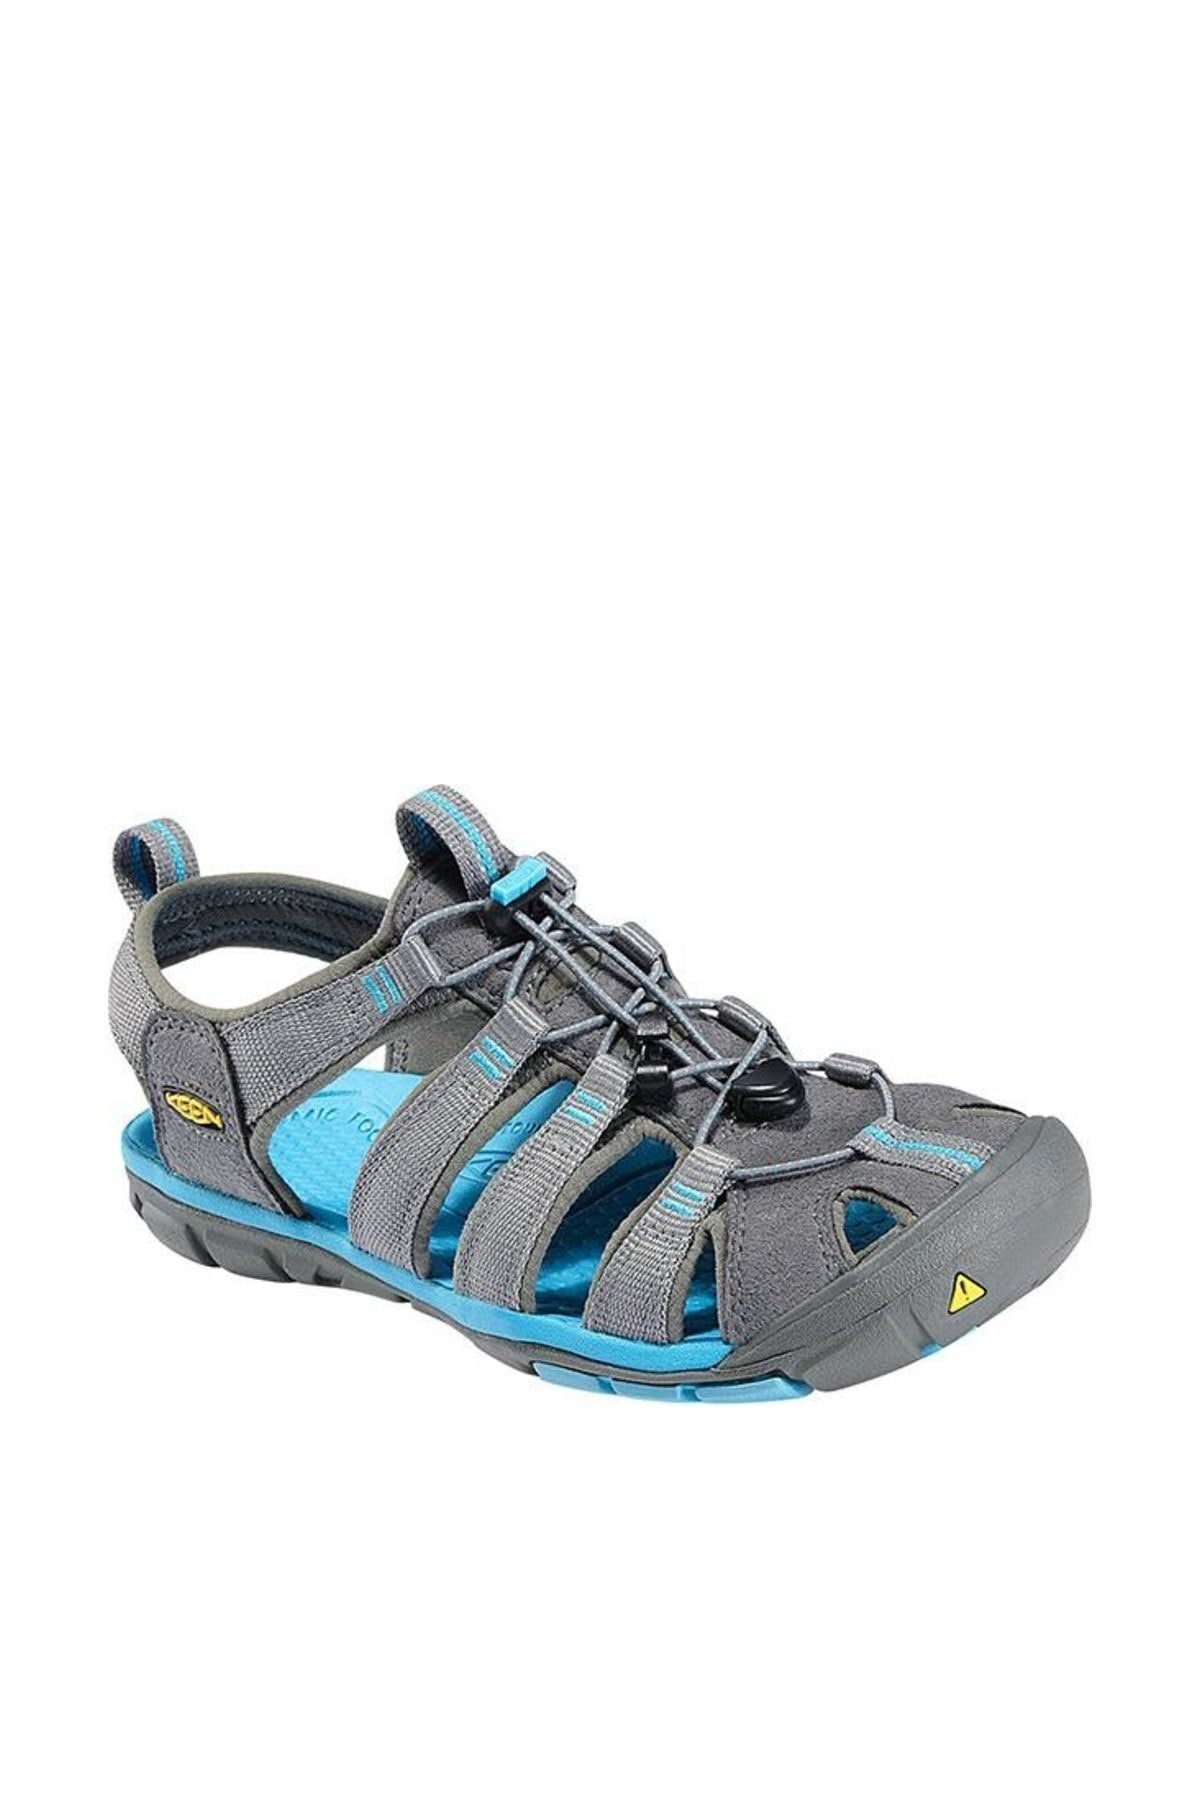 Keen Clearwater Cnx Kadın Sandalet 1008772 1